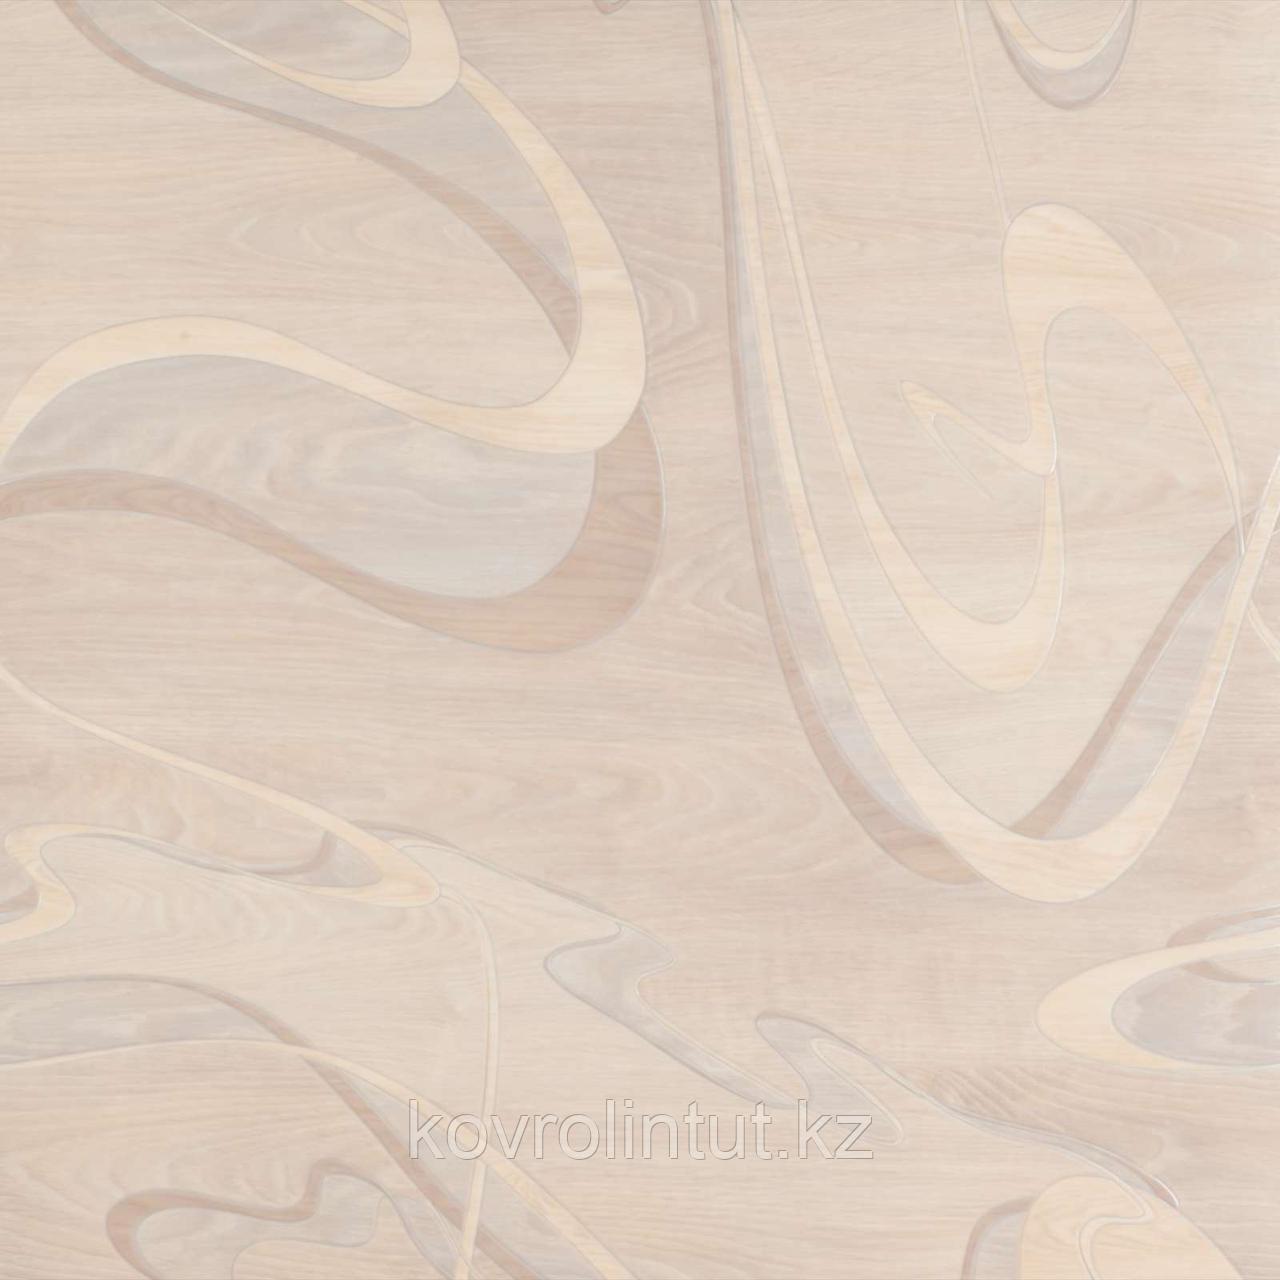 Линолеум Tarkett бытовой Grand Aston 2 3,5 м